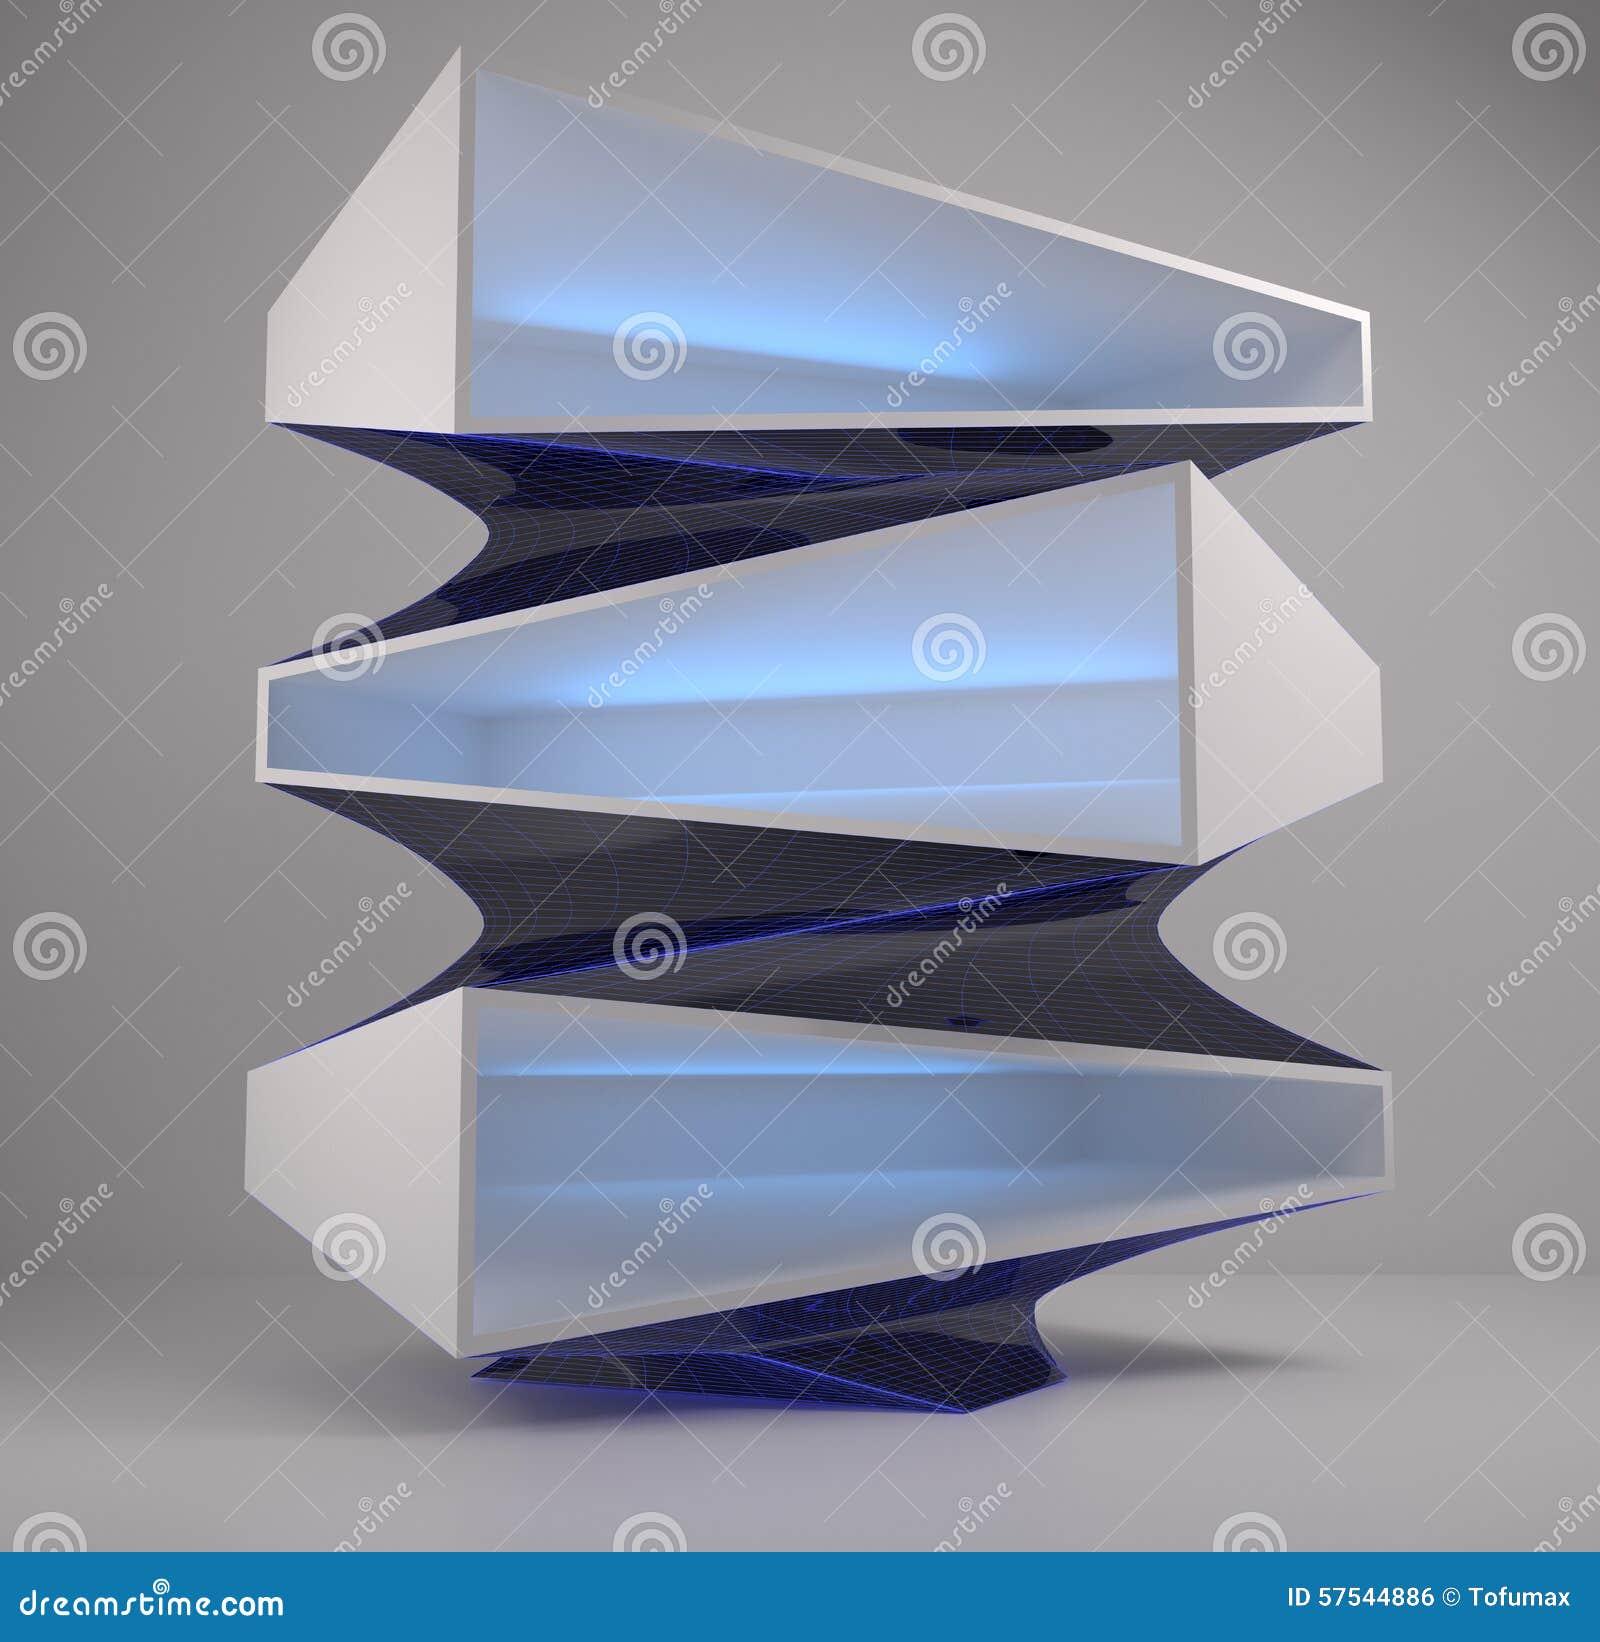 Architecture concept design stock illustration image for What is design concept in architecture